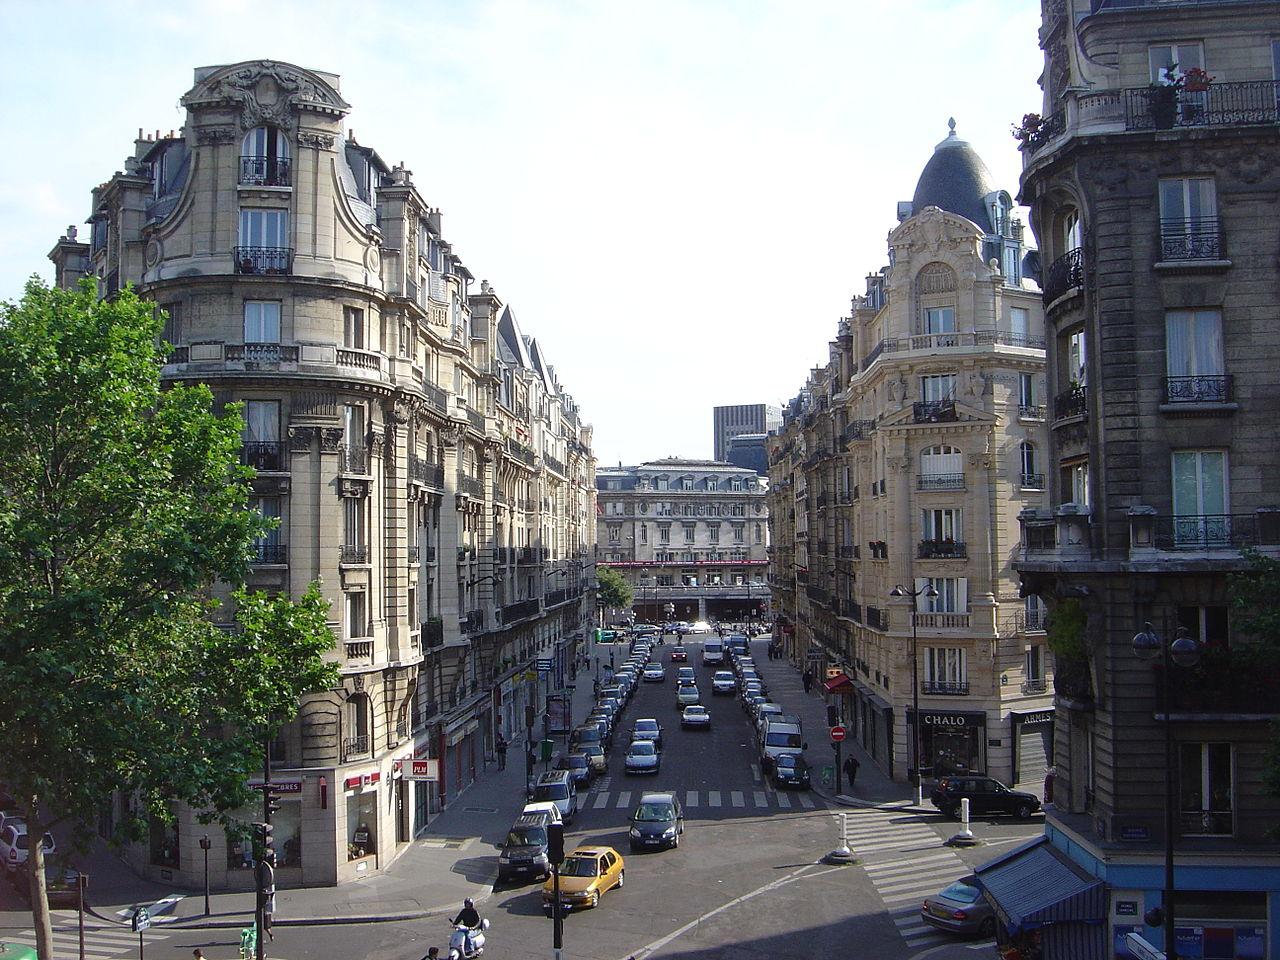 Khung cảnh Phố Belleville Paris